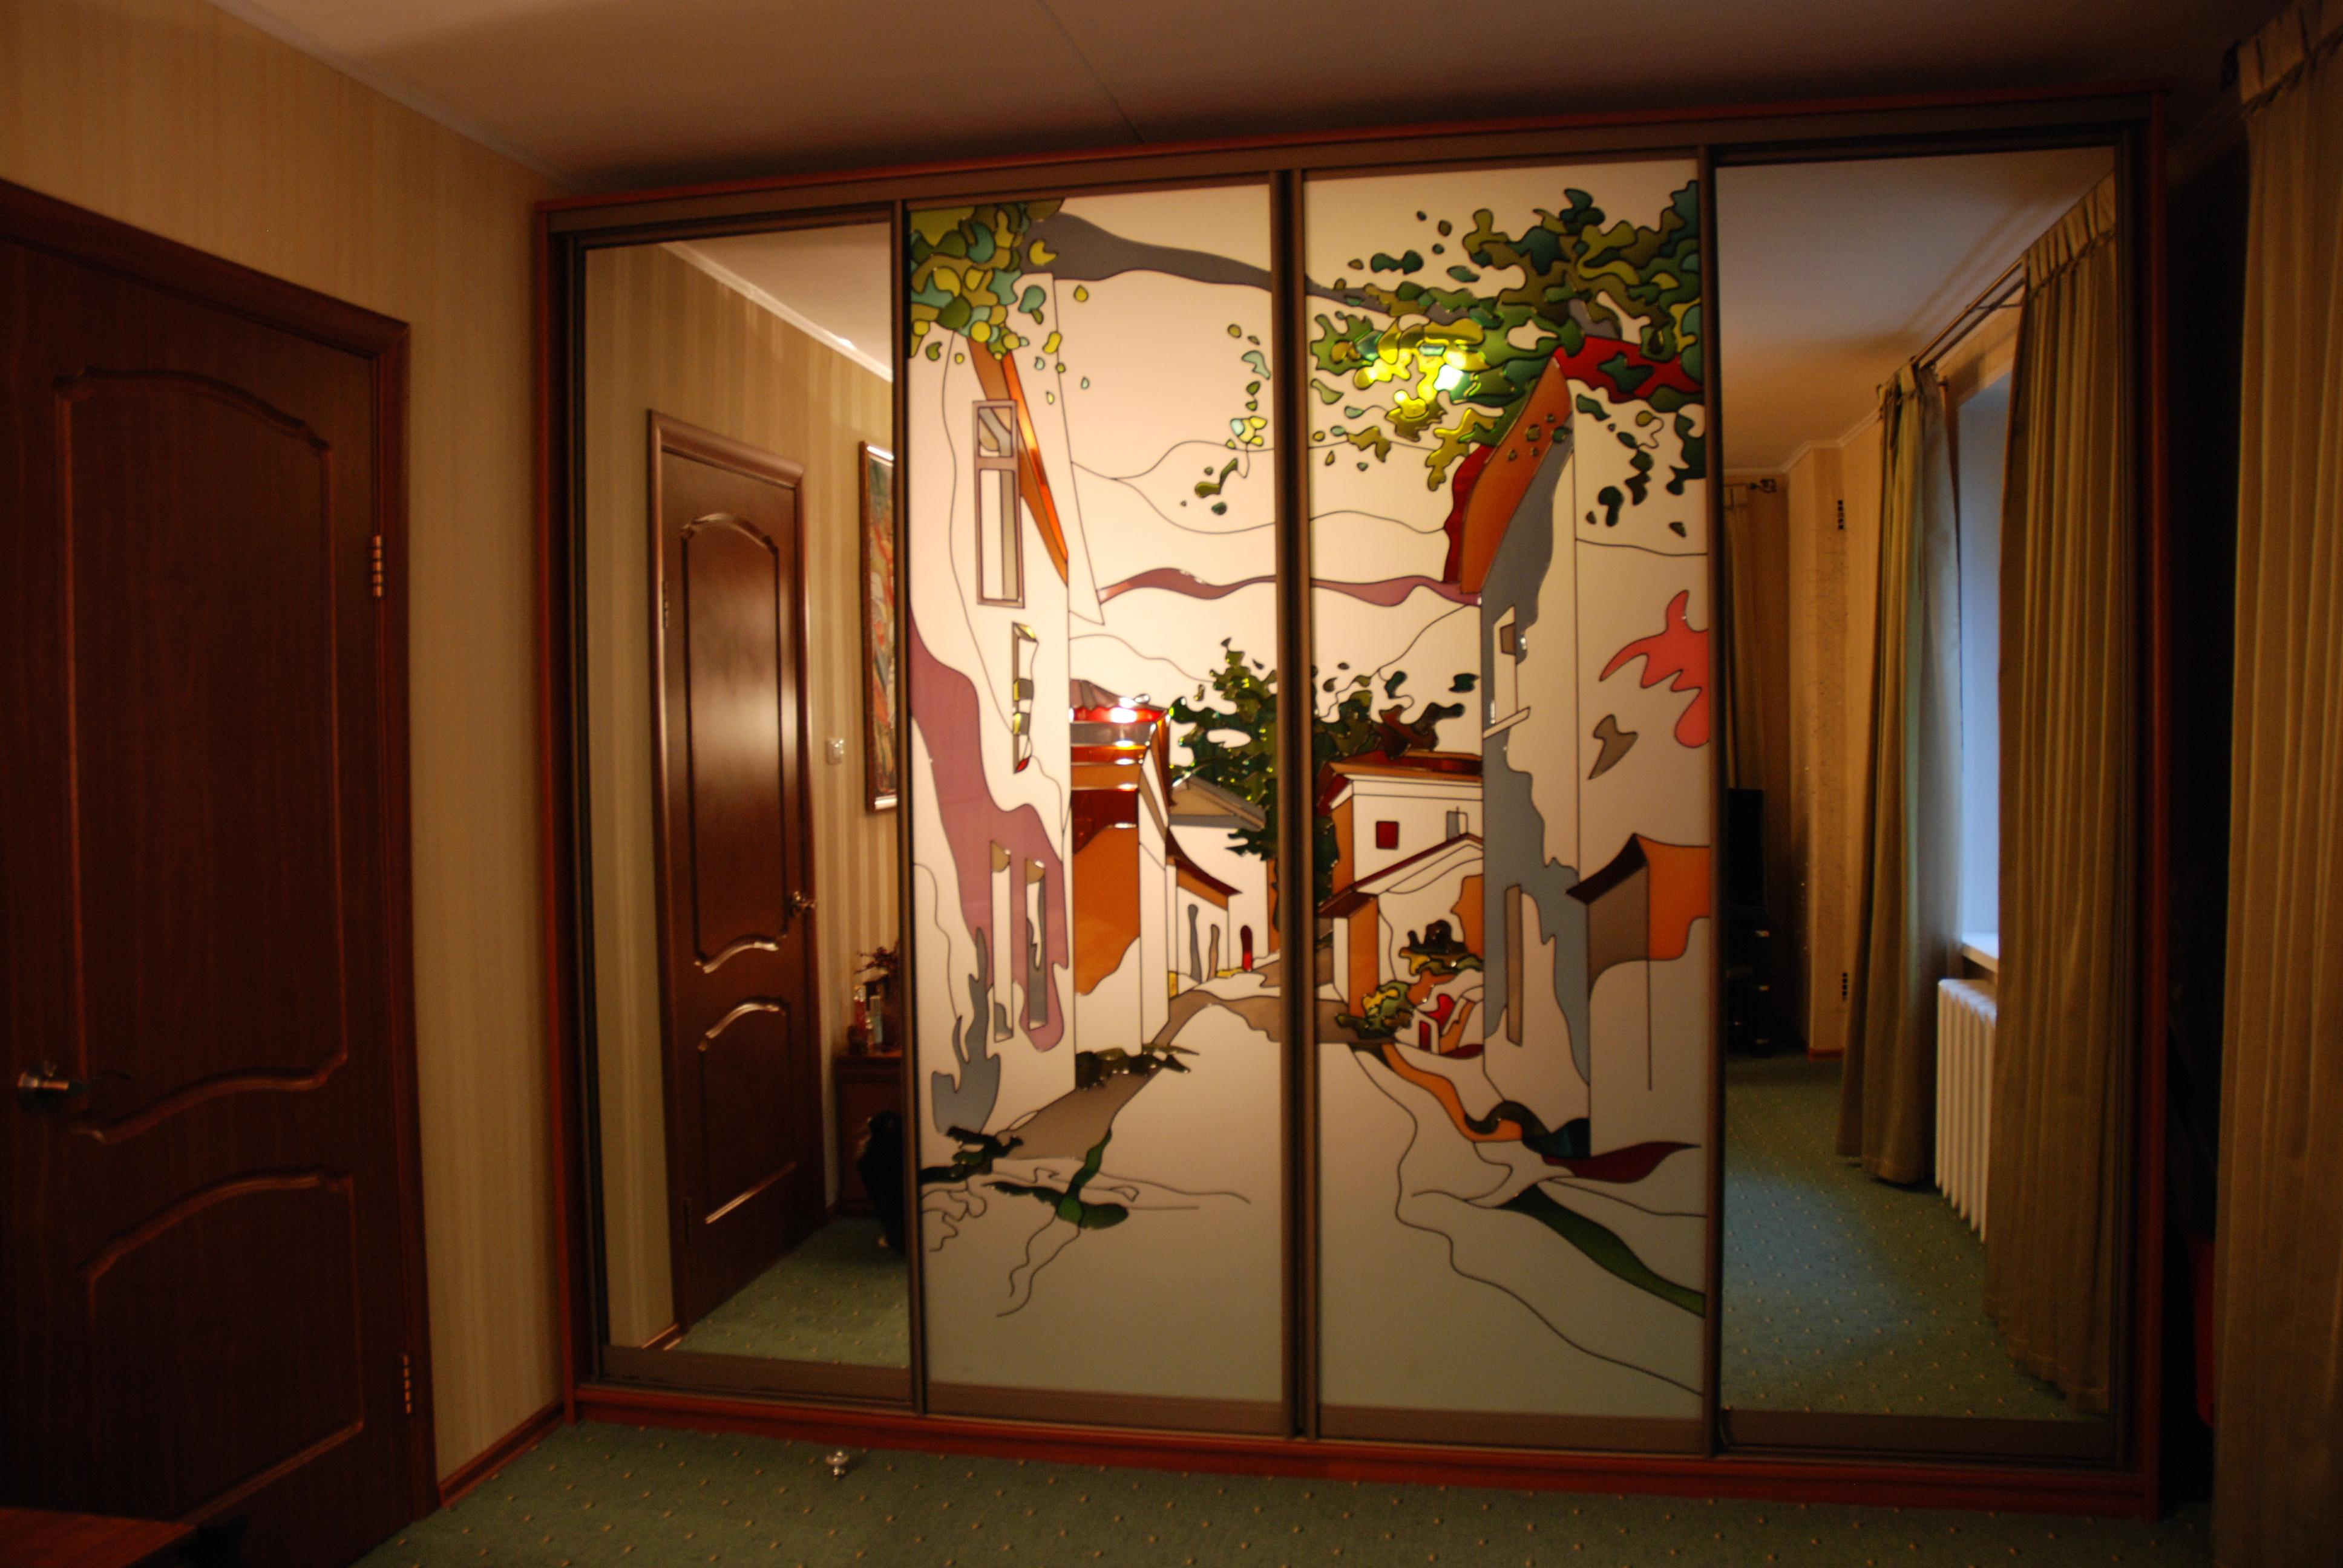 Шкафы-купе с витражами / меркурий мебель г. хабаровск, изгот.